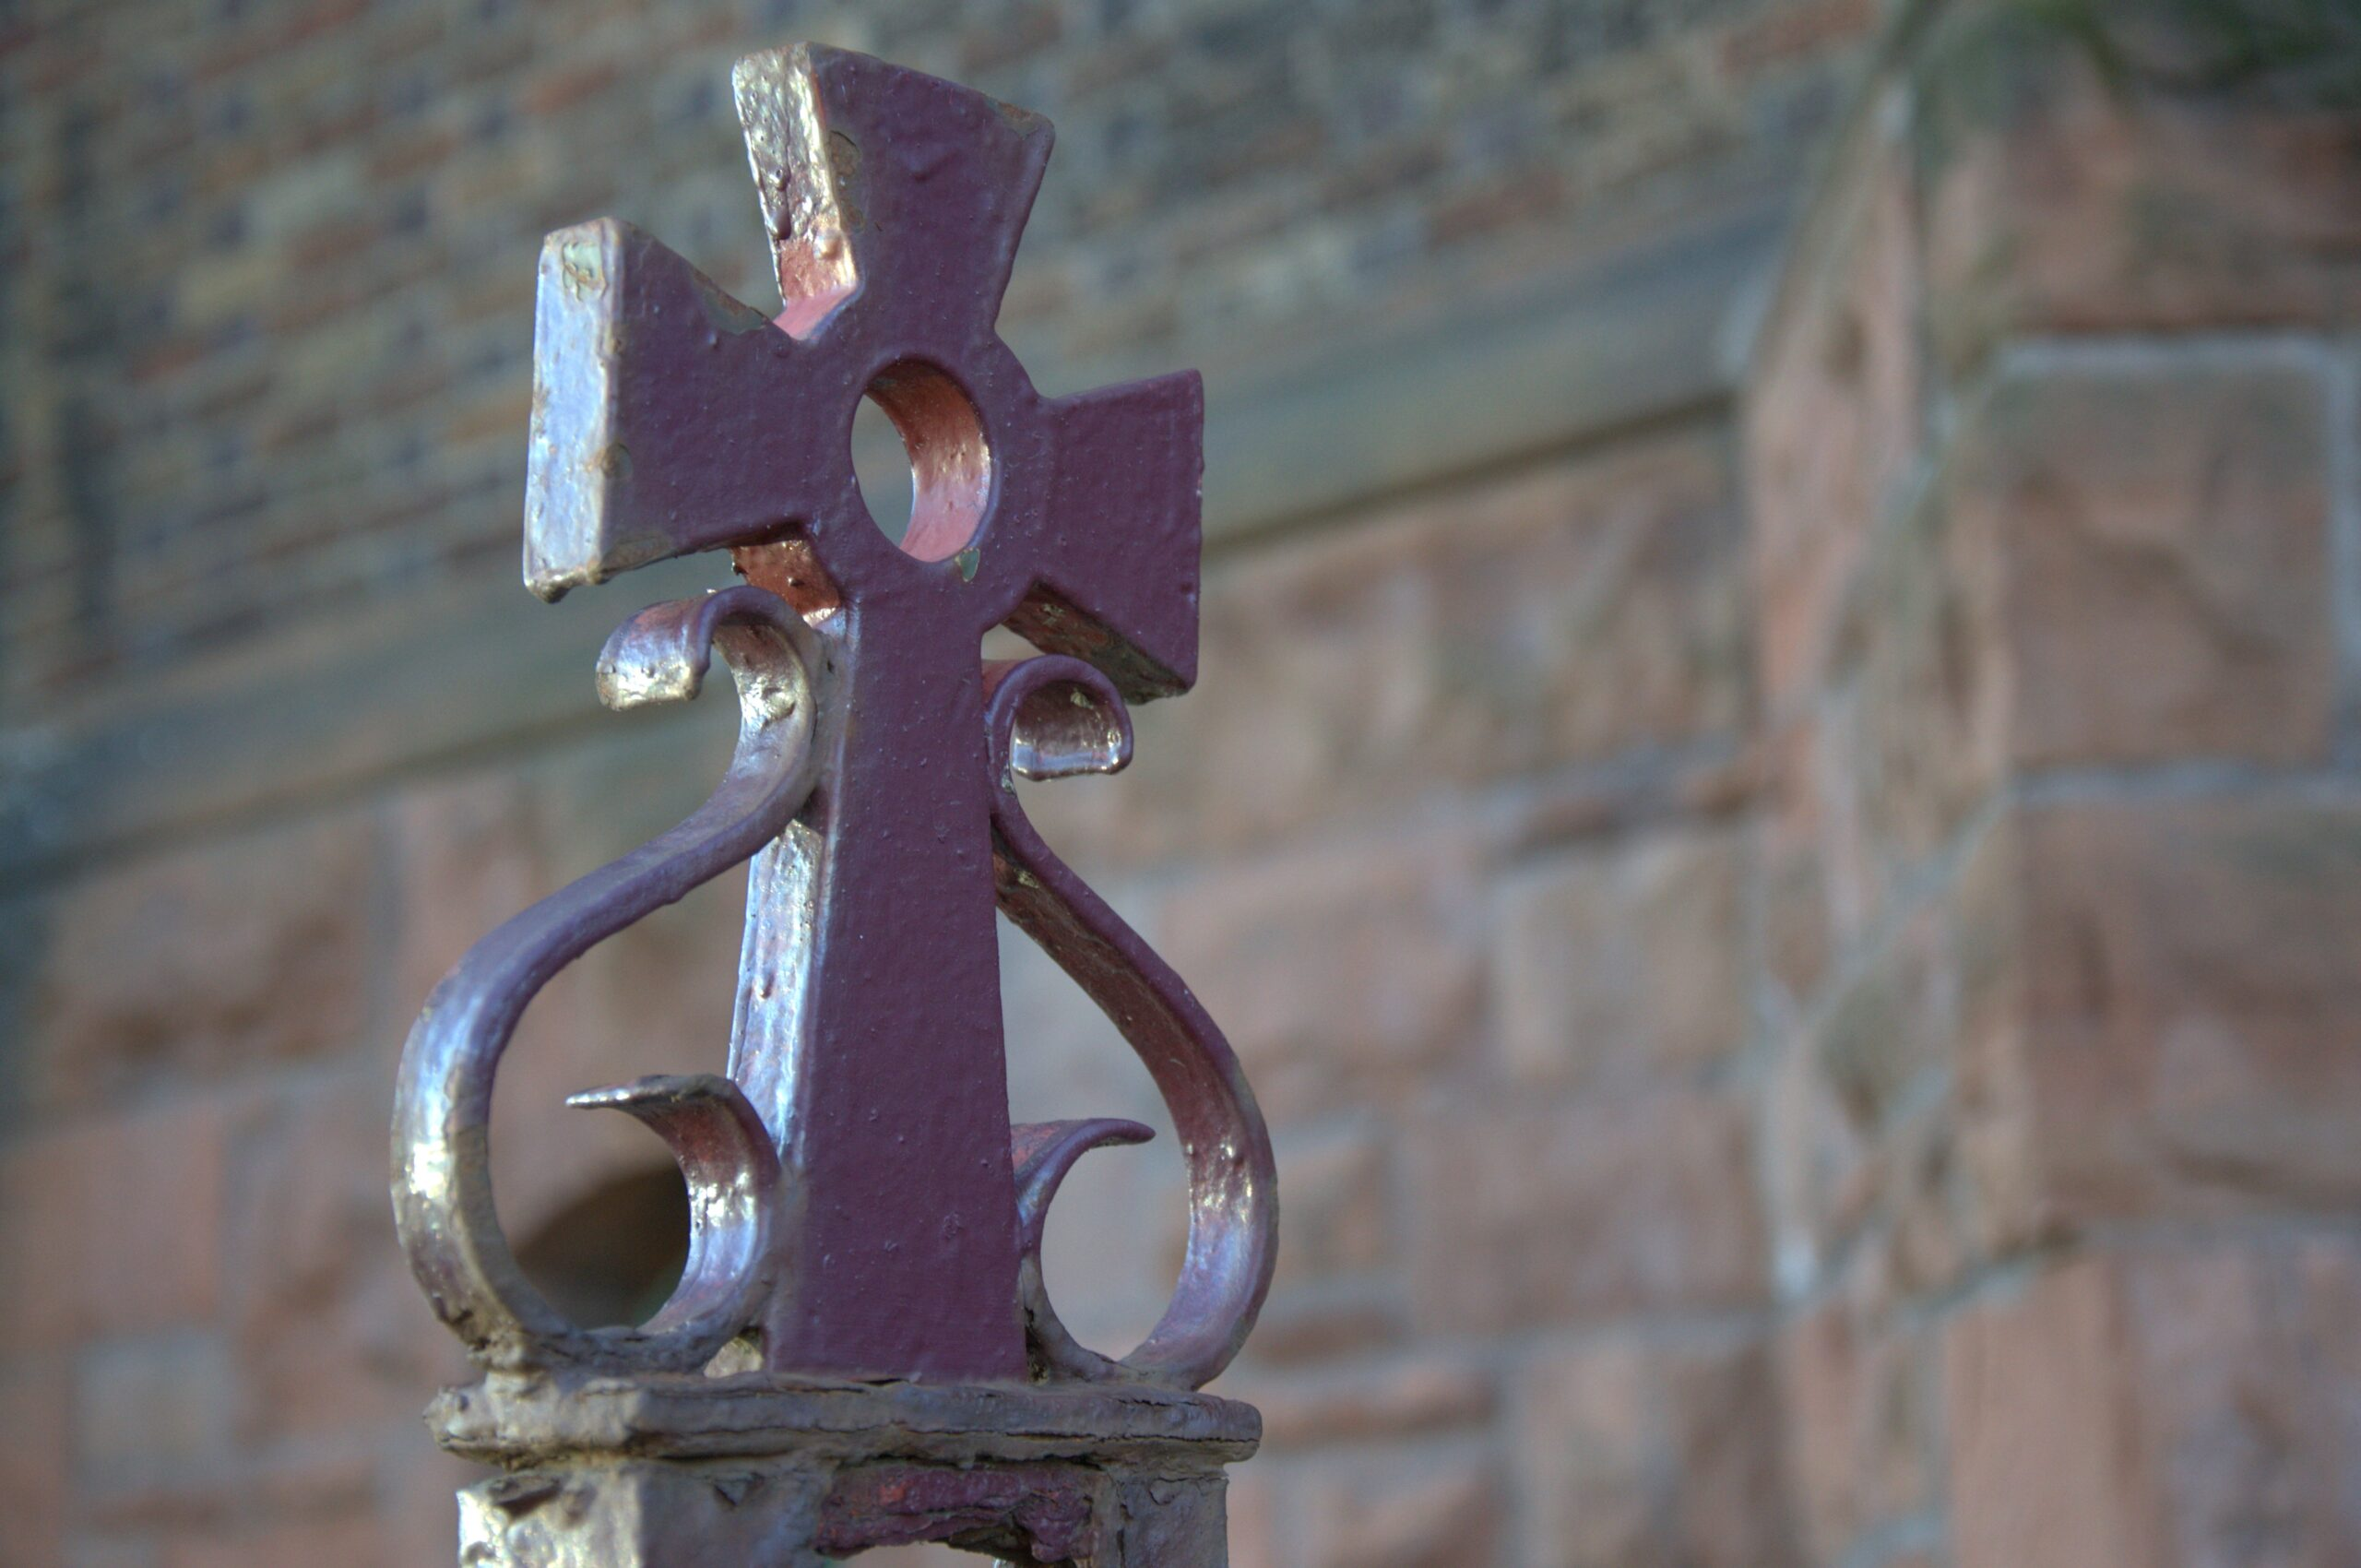 Cross outside a church